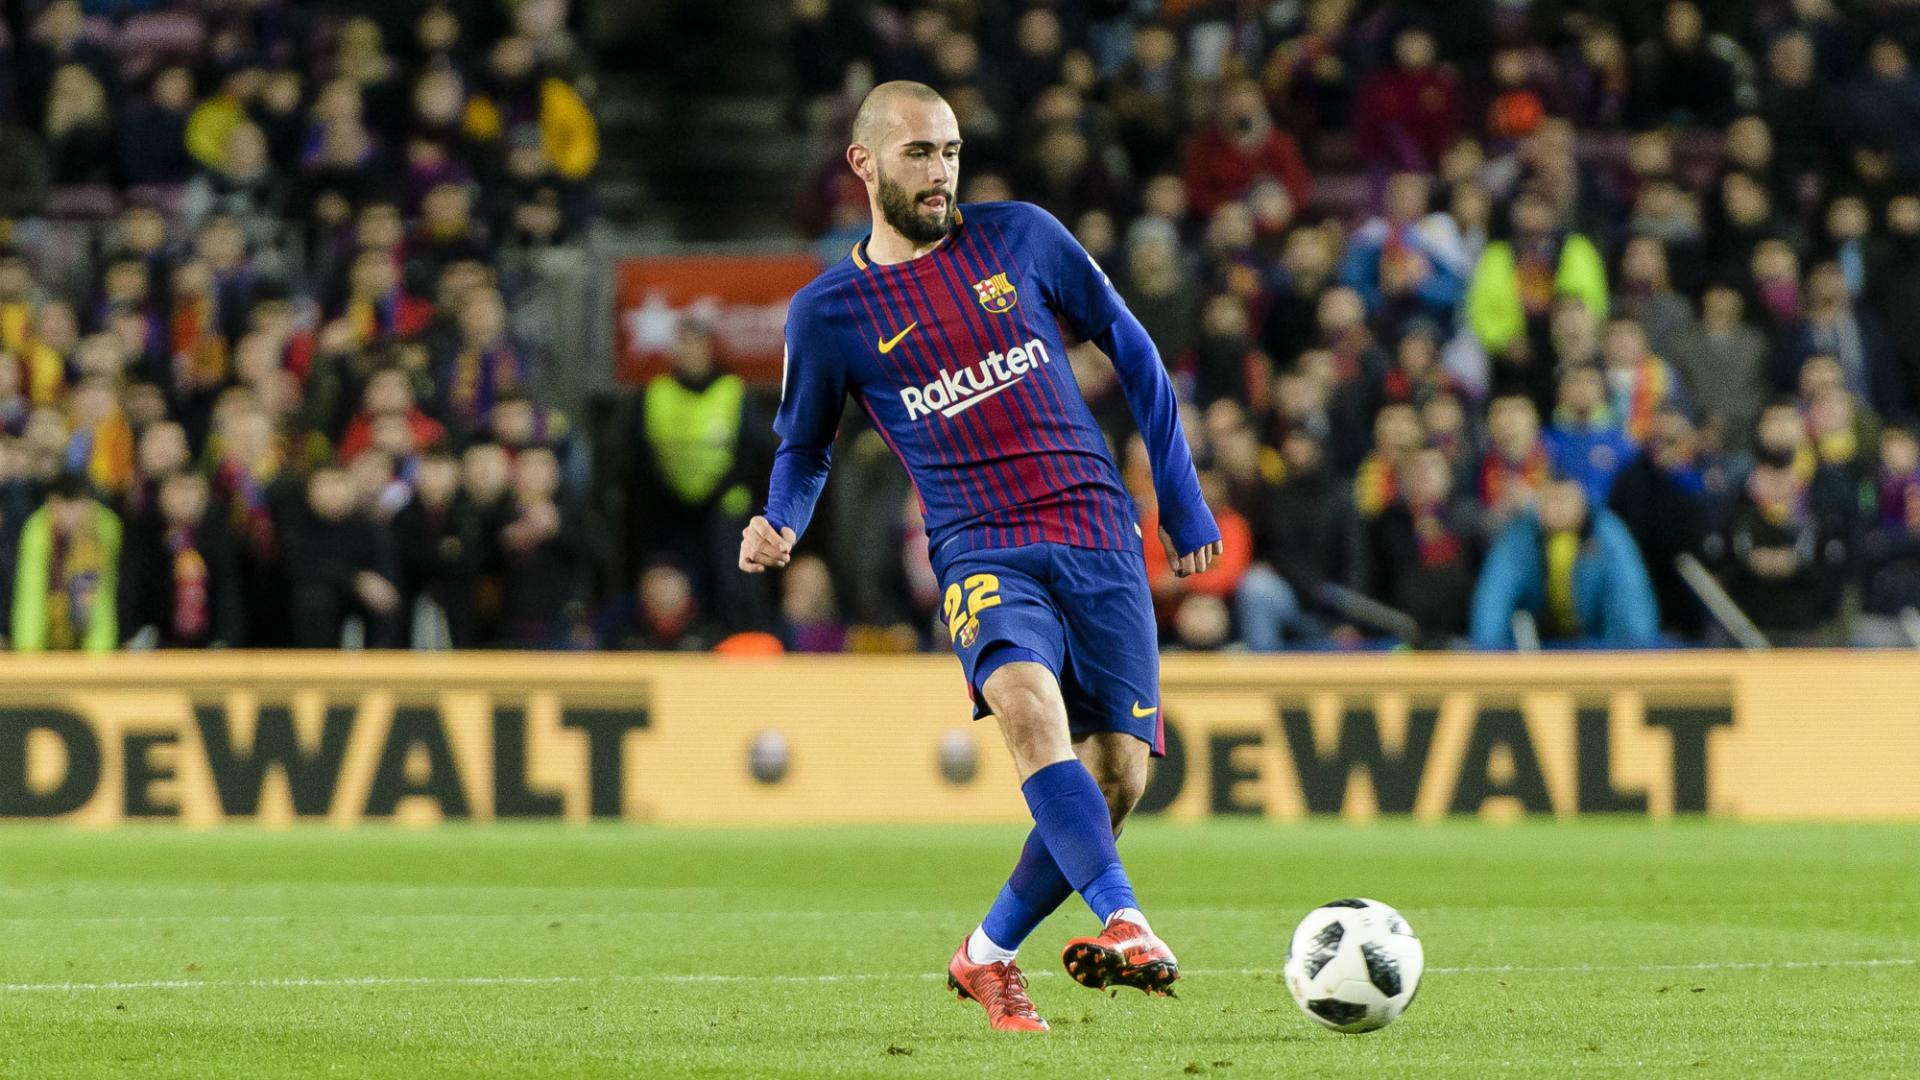 Aleix Vidal FC Barcelona Saison 2017/18